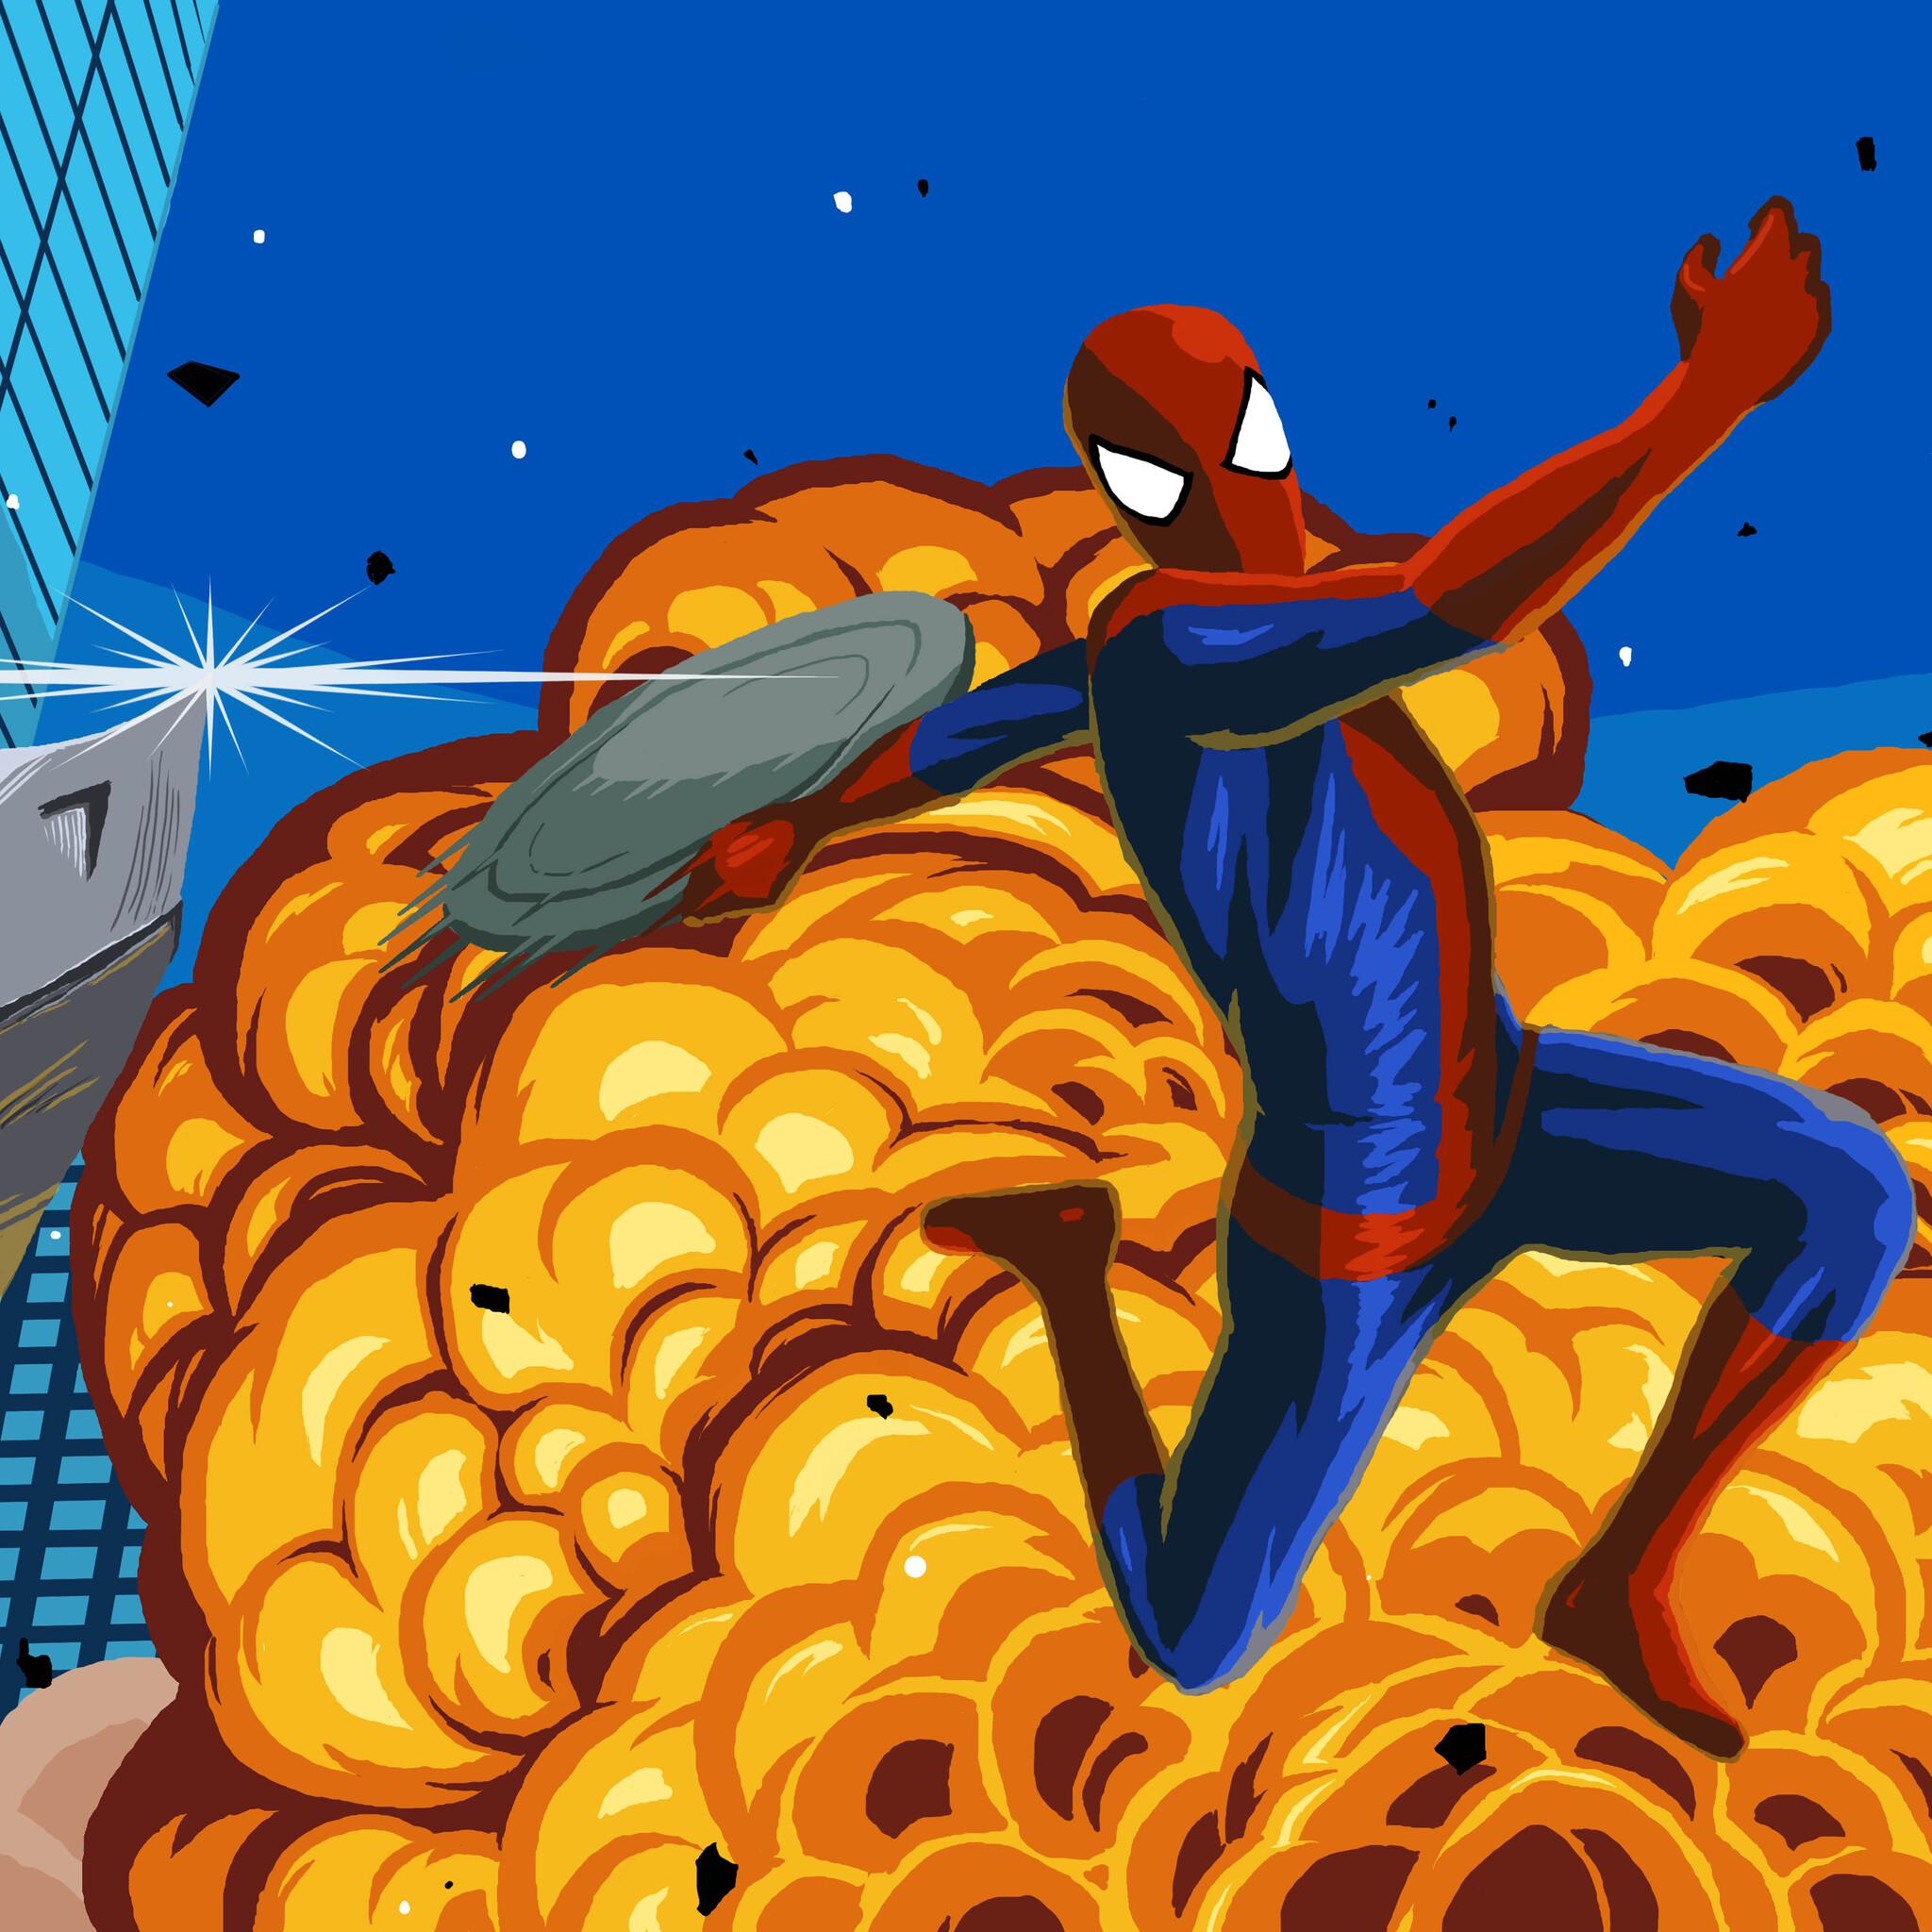 2048x2048 Spiderman Vs Rhino 8K Artwork Ipad Air HD 4k